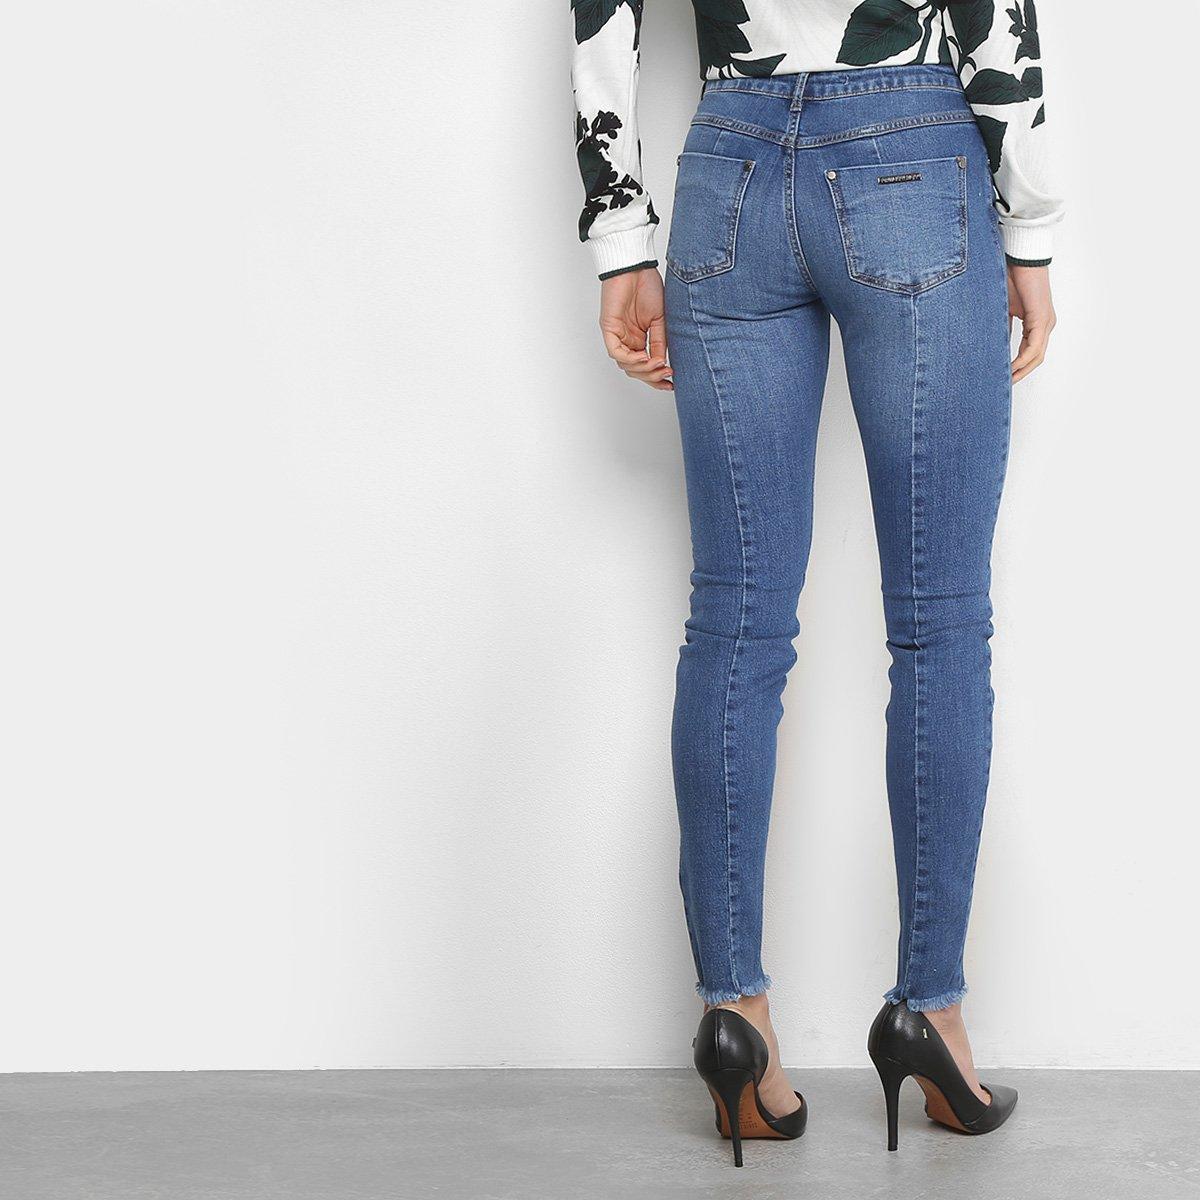 328dd67330 Calça Jeans Skinny Forum Marisa Cintura Média Feminina - Compre ...